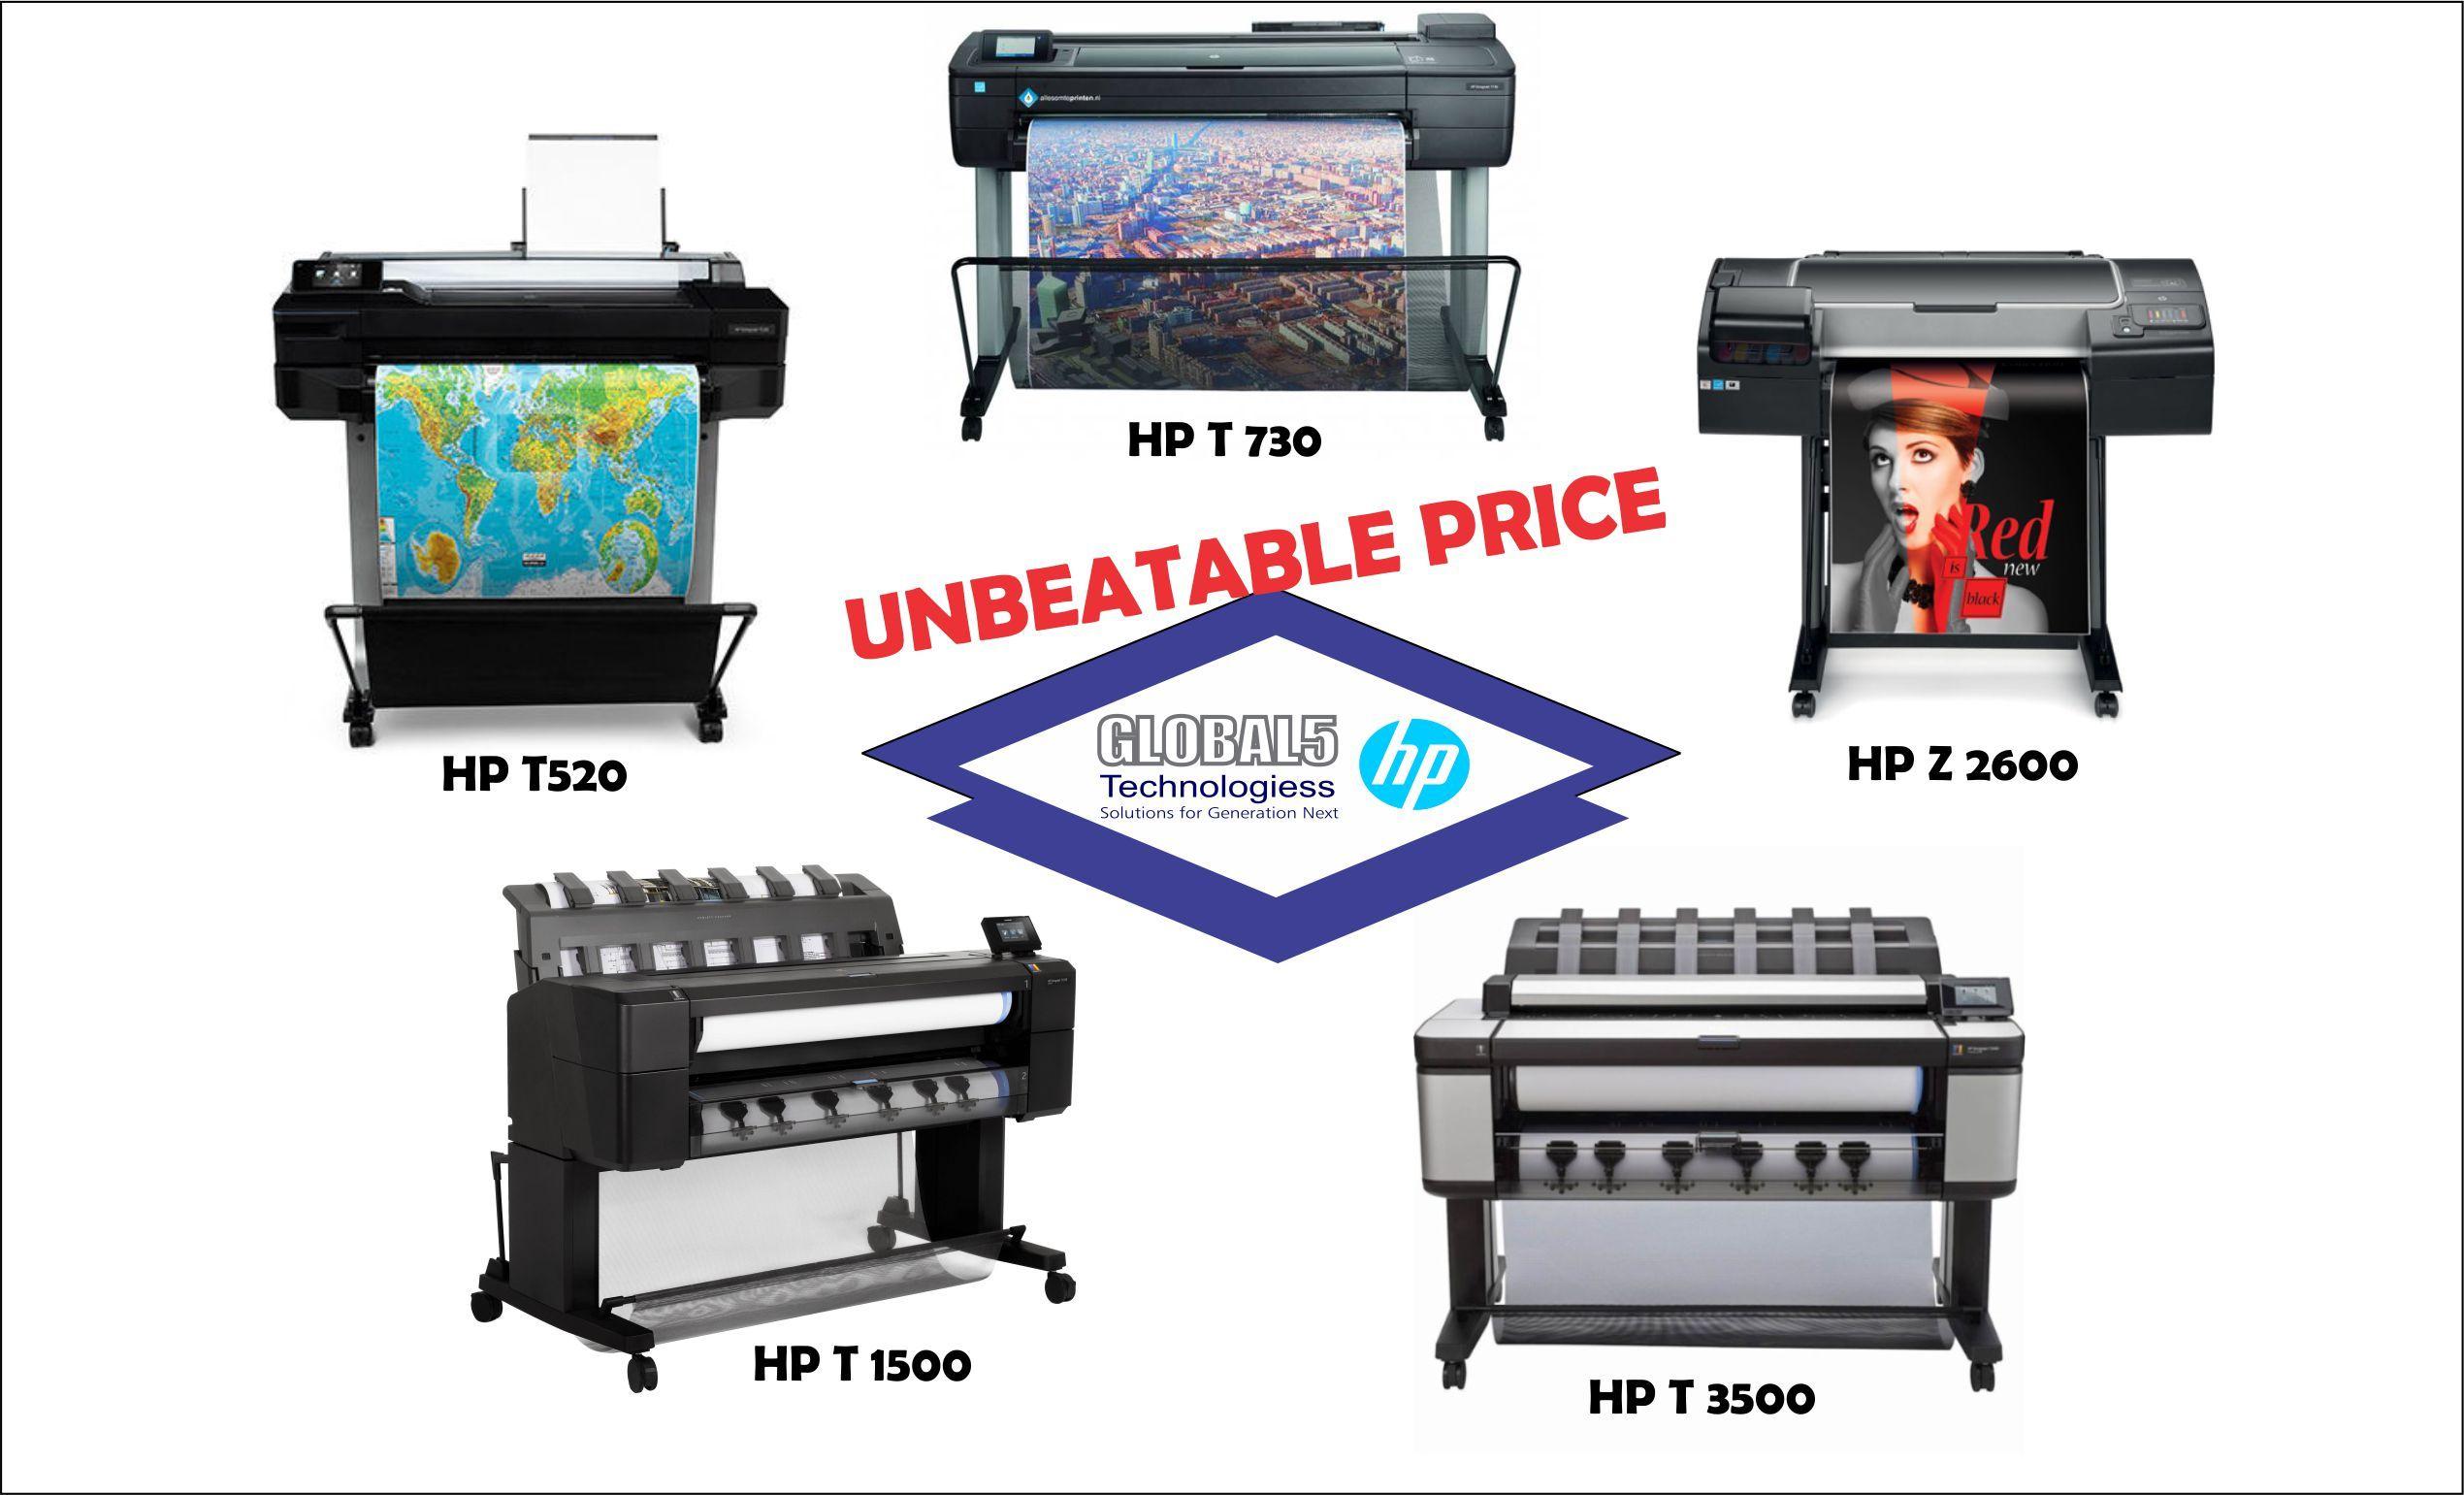 Pin by Global5Technologiess on HP Printers | Hp printer